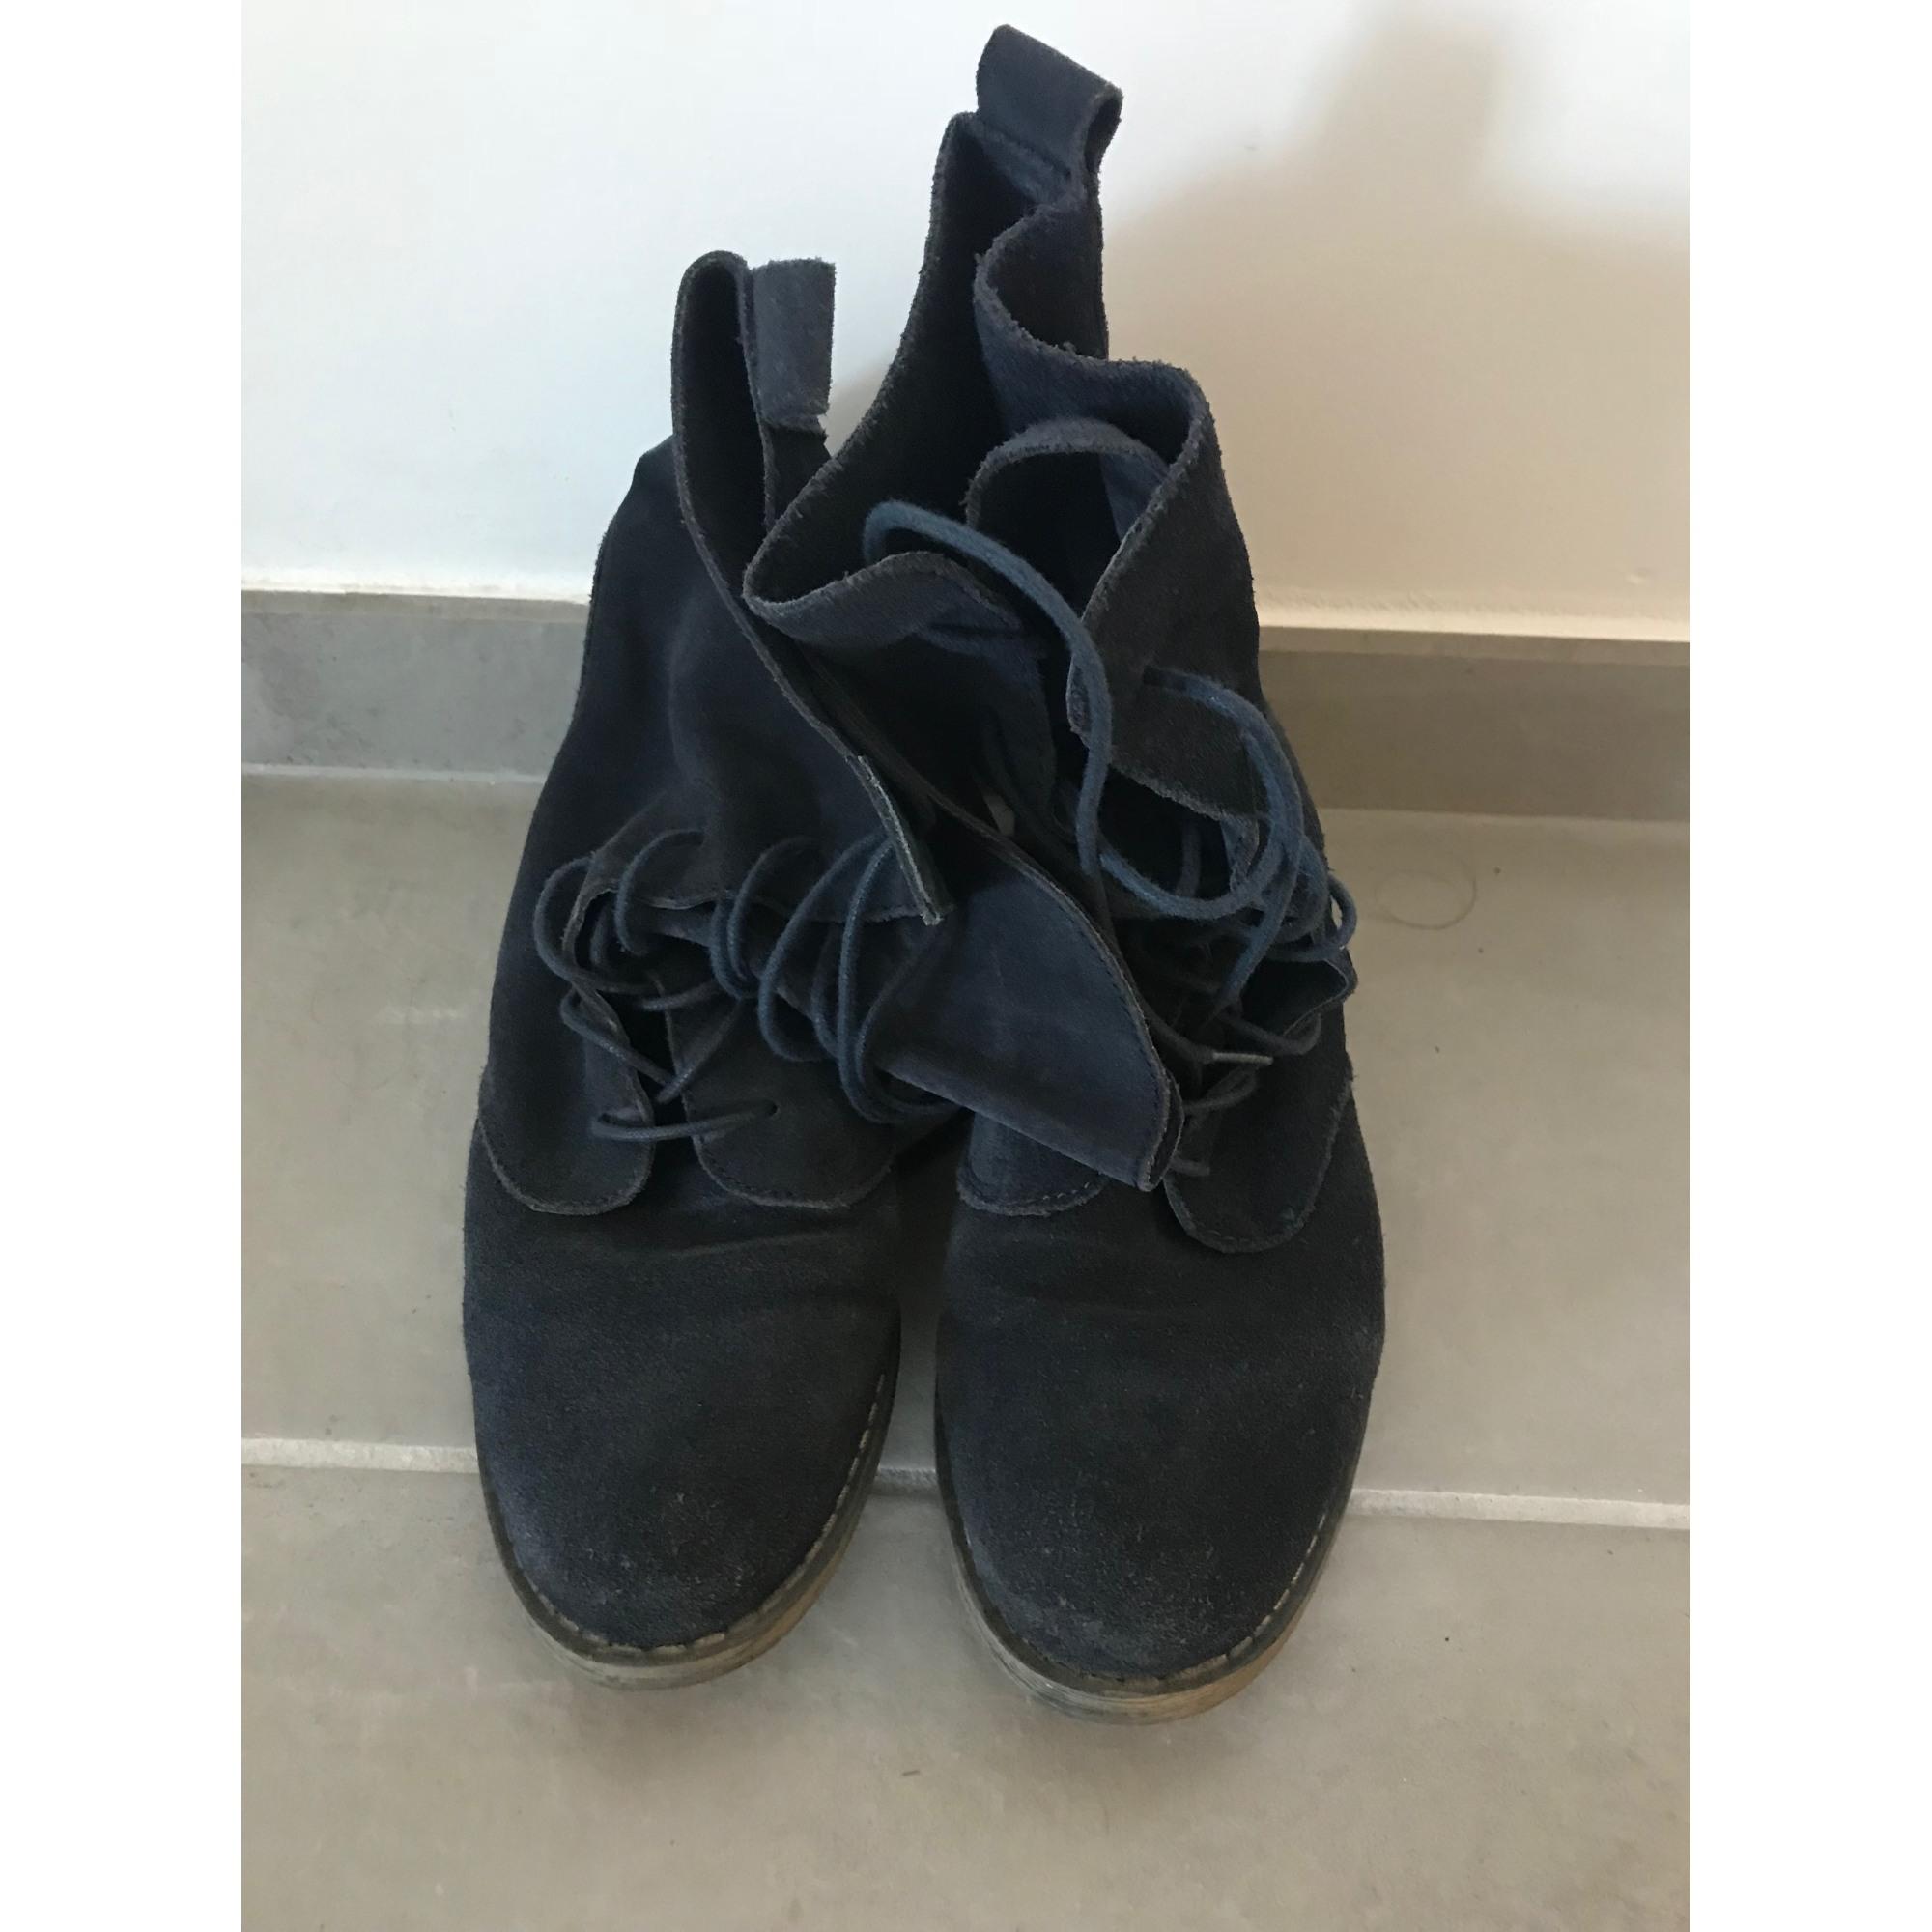 Bottines & low boots plates LA REDOUTE Bleu, bleu marine, bleu turquoise